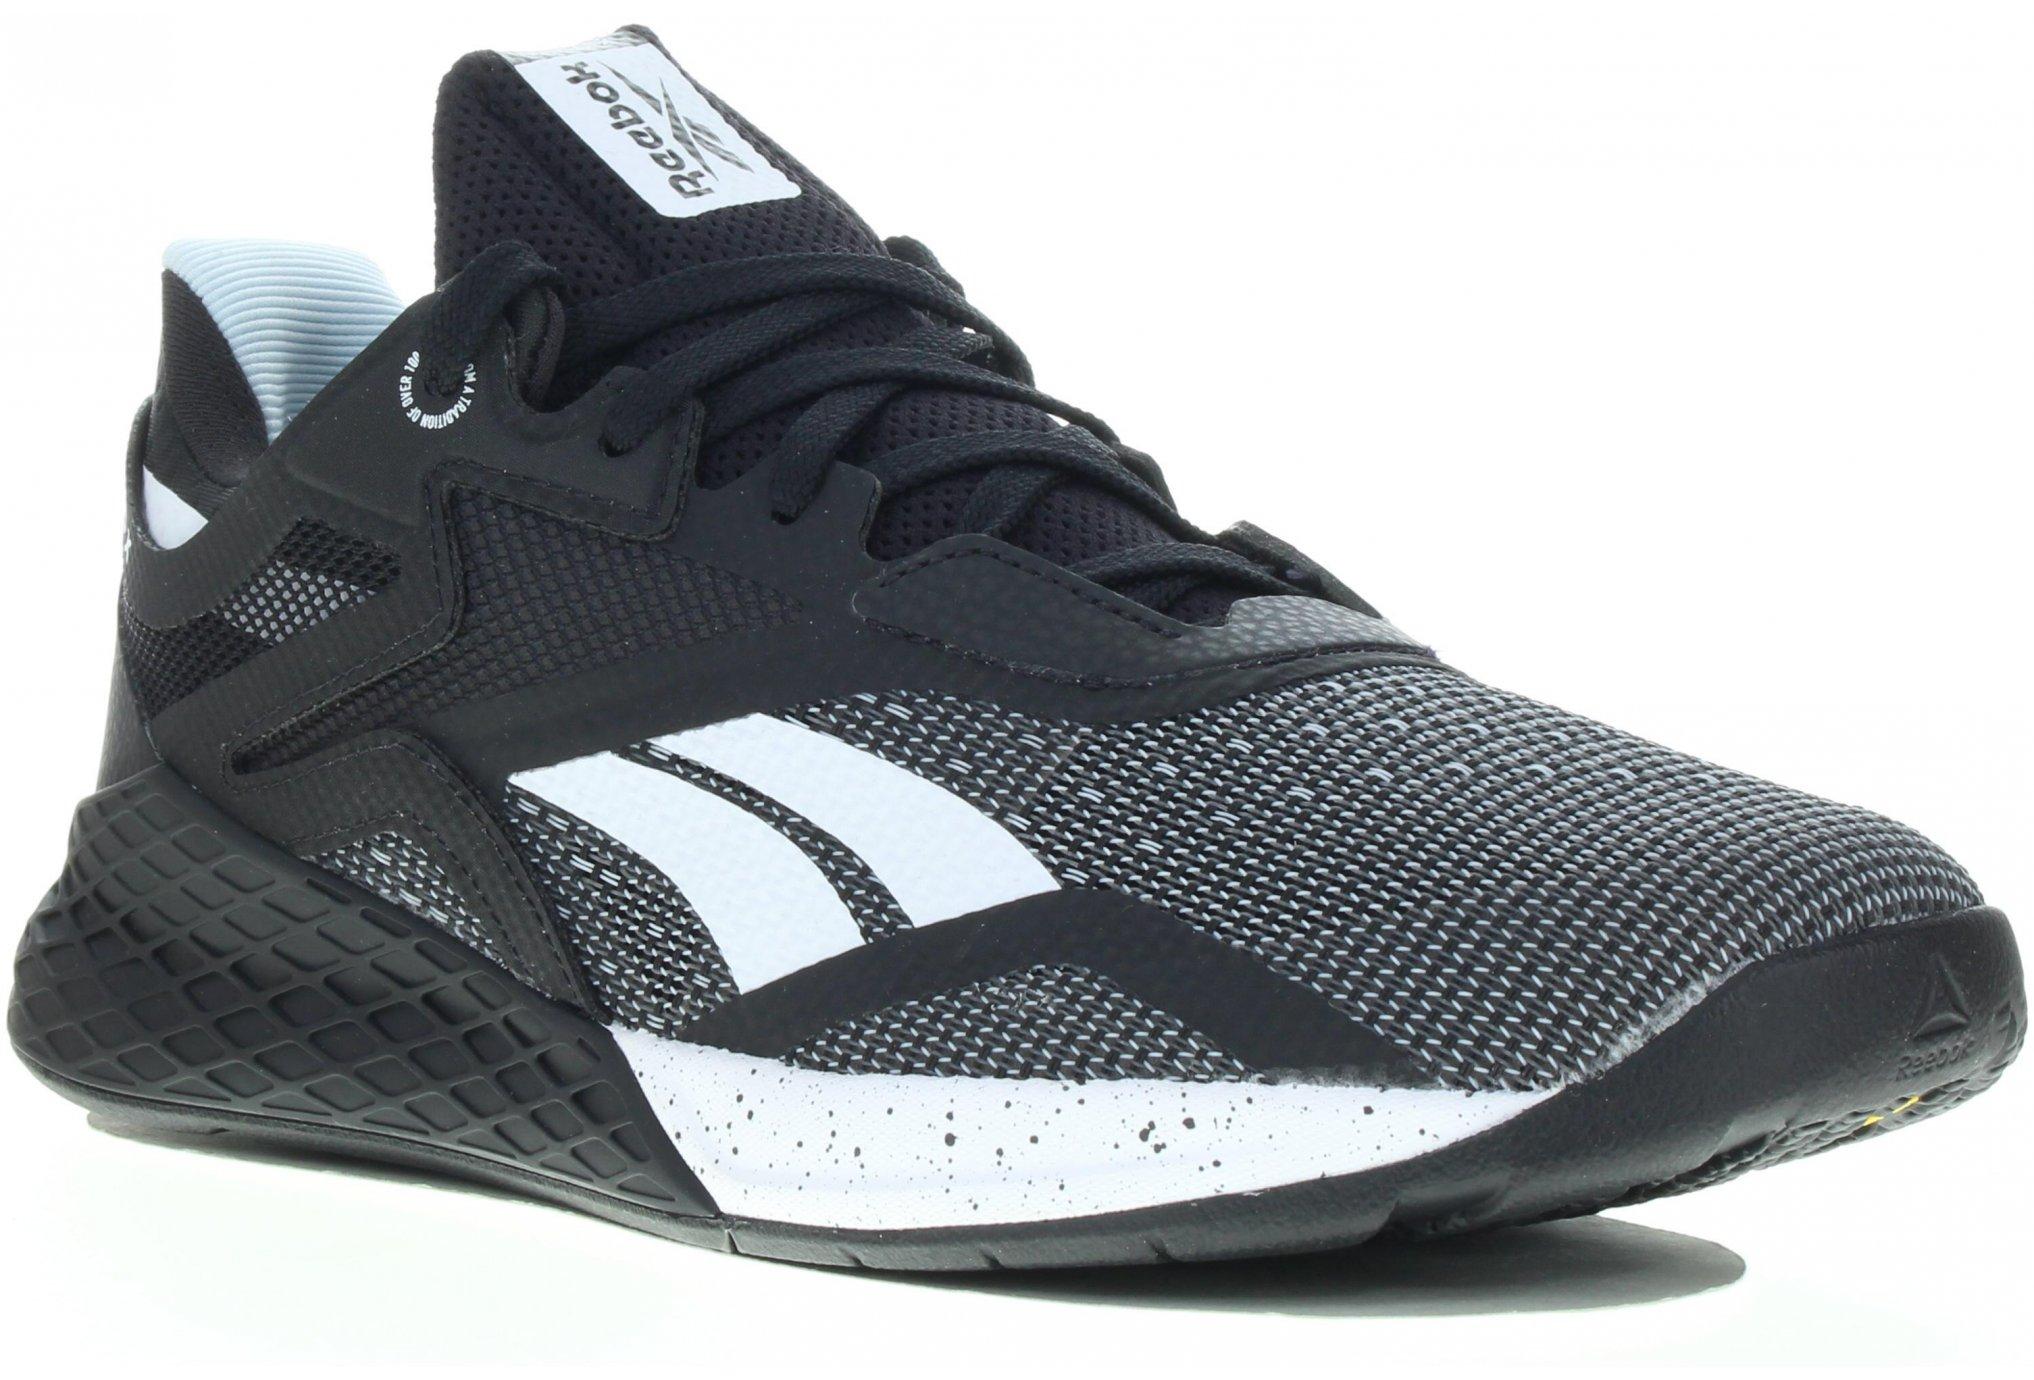 Reebok Nano X W Chaussures running femme